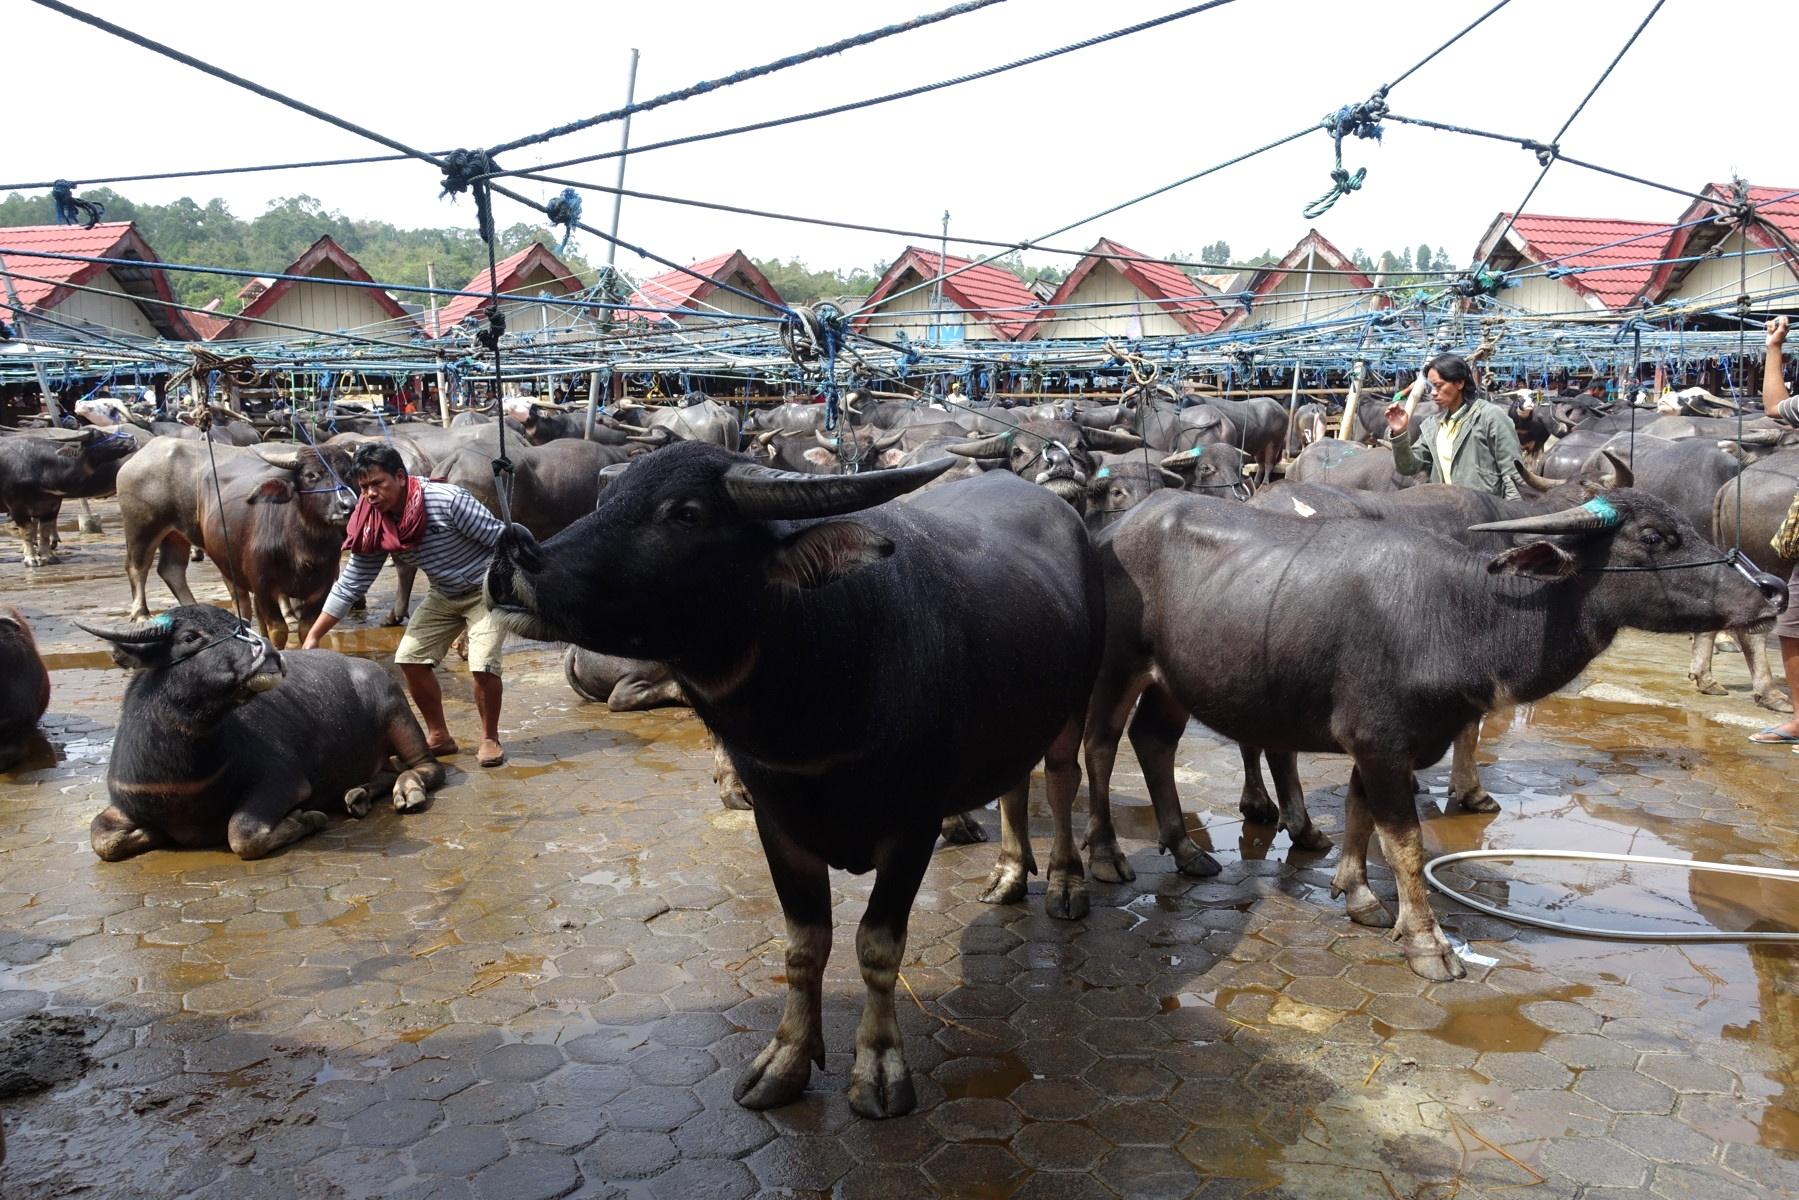 Indonesie_Sulawesi_Toraja_Rantepao DSC05028